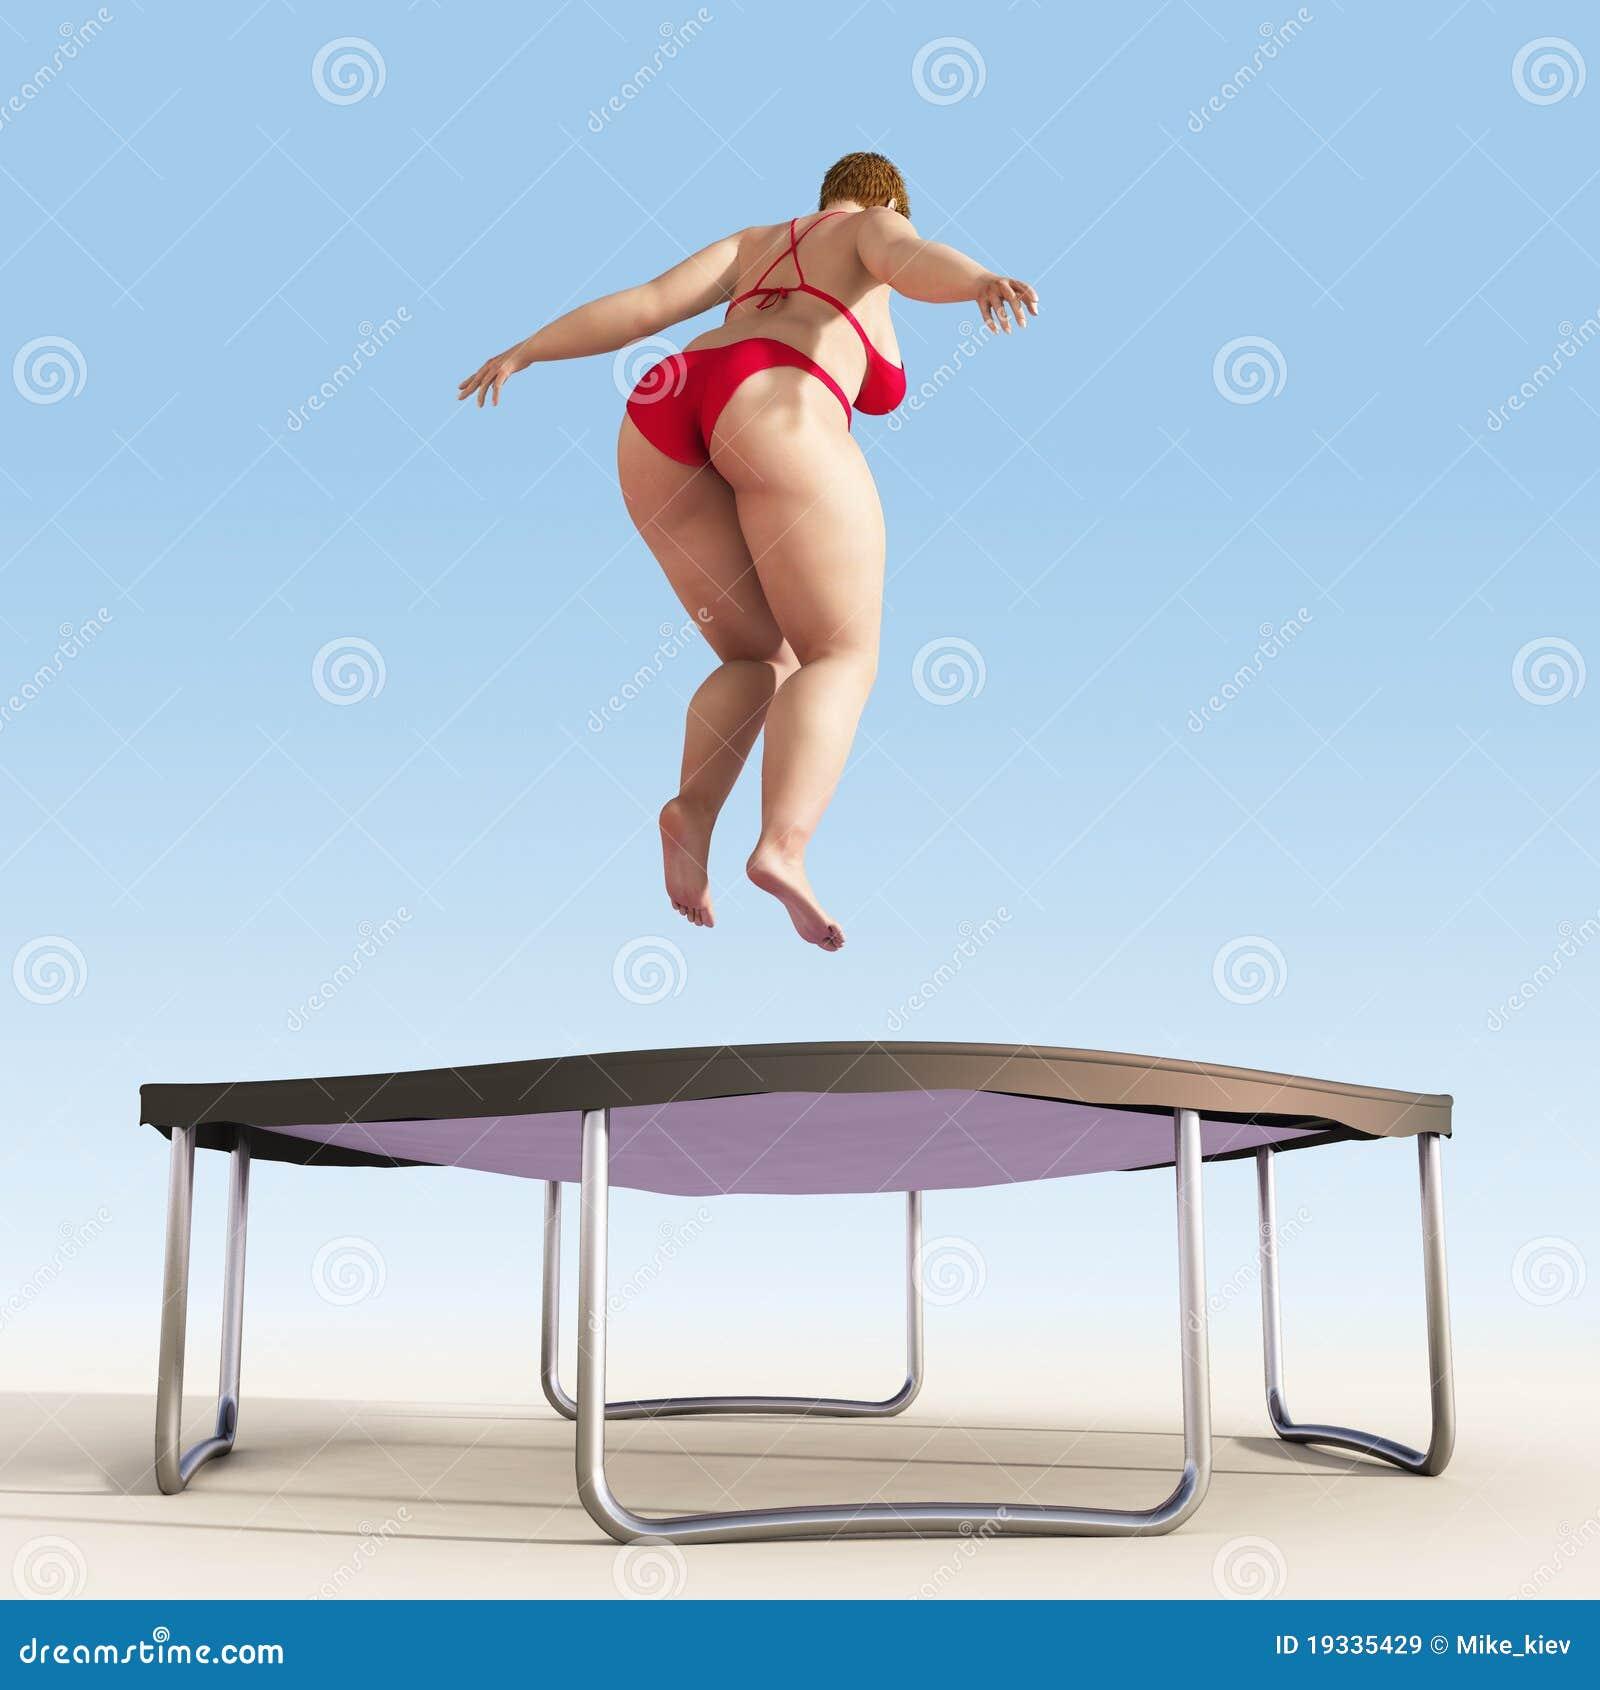 girls-in-bikinis-on-trampolines-woman-wanks-cock